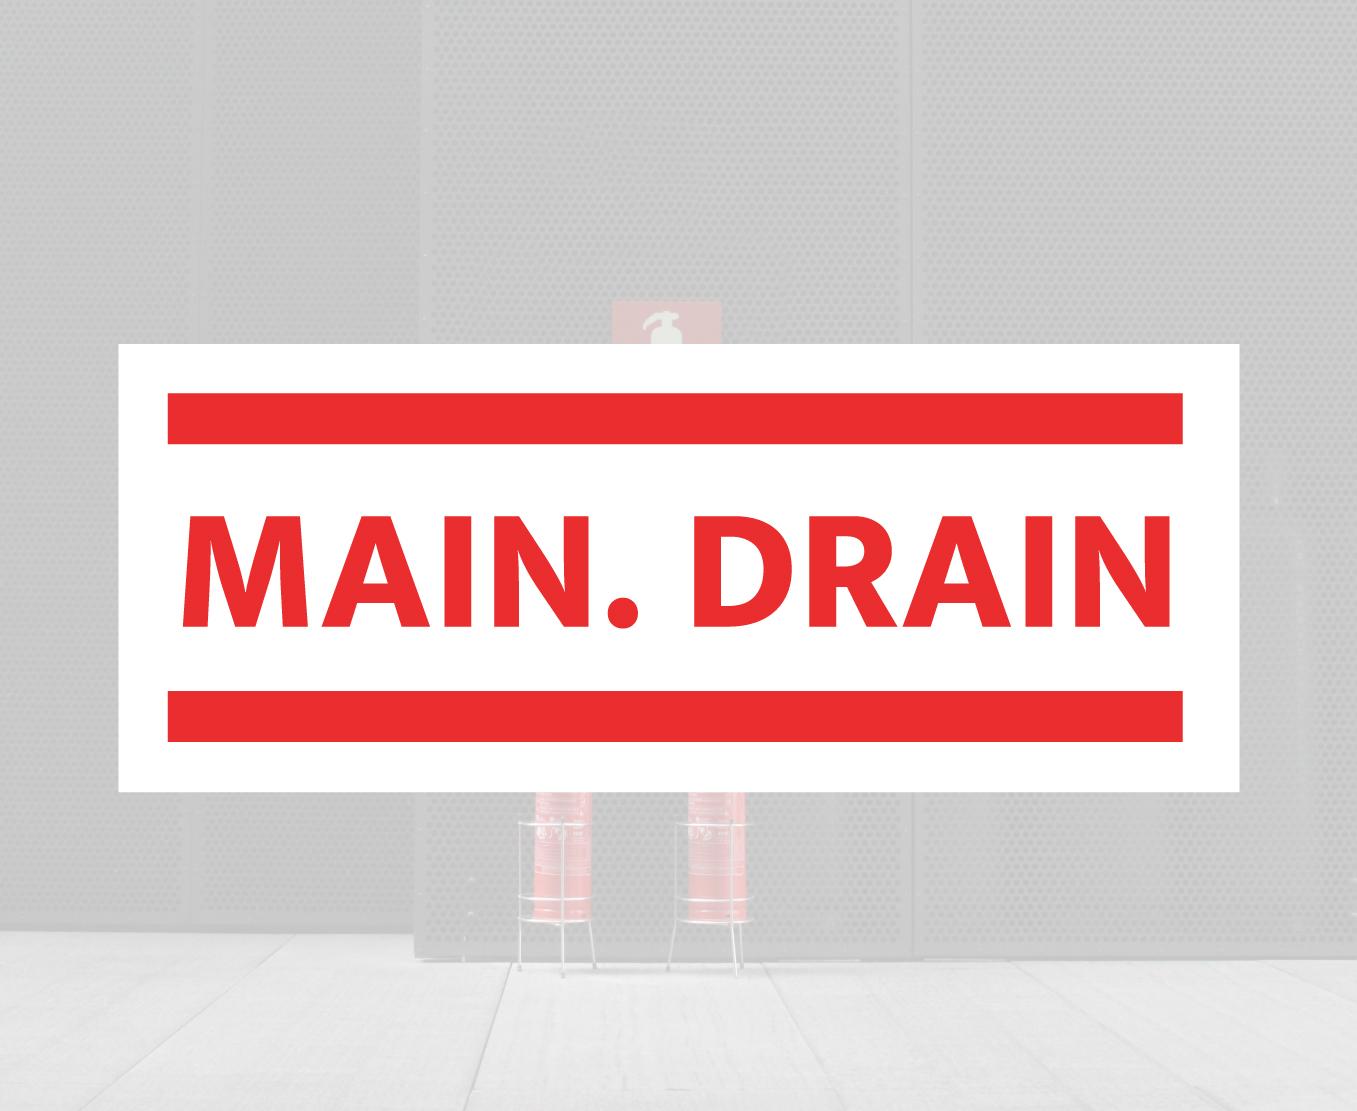 Main Drain Building Sign